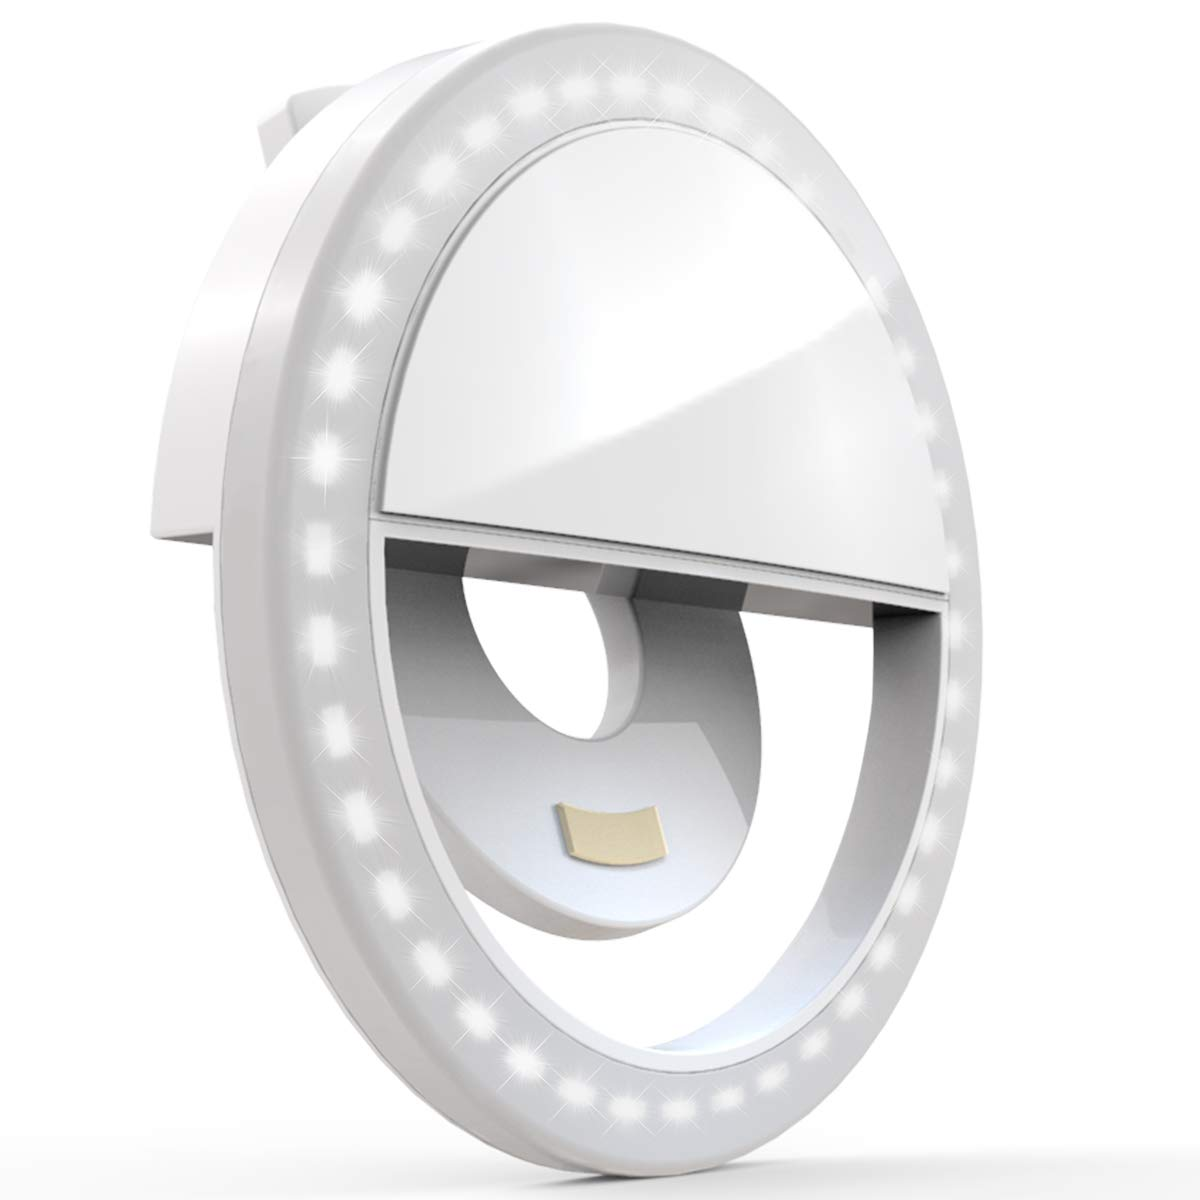 Auxiwa Selfie Rechargeable Battery Camera